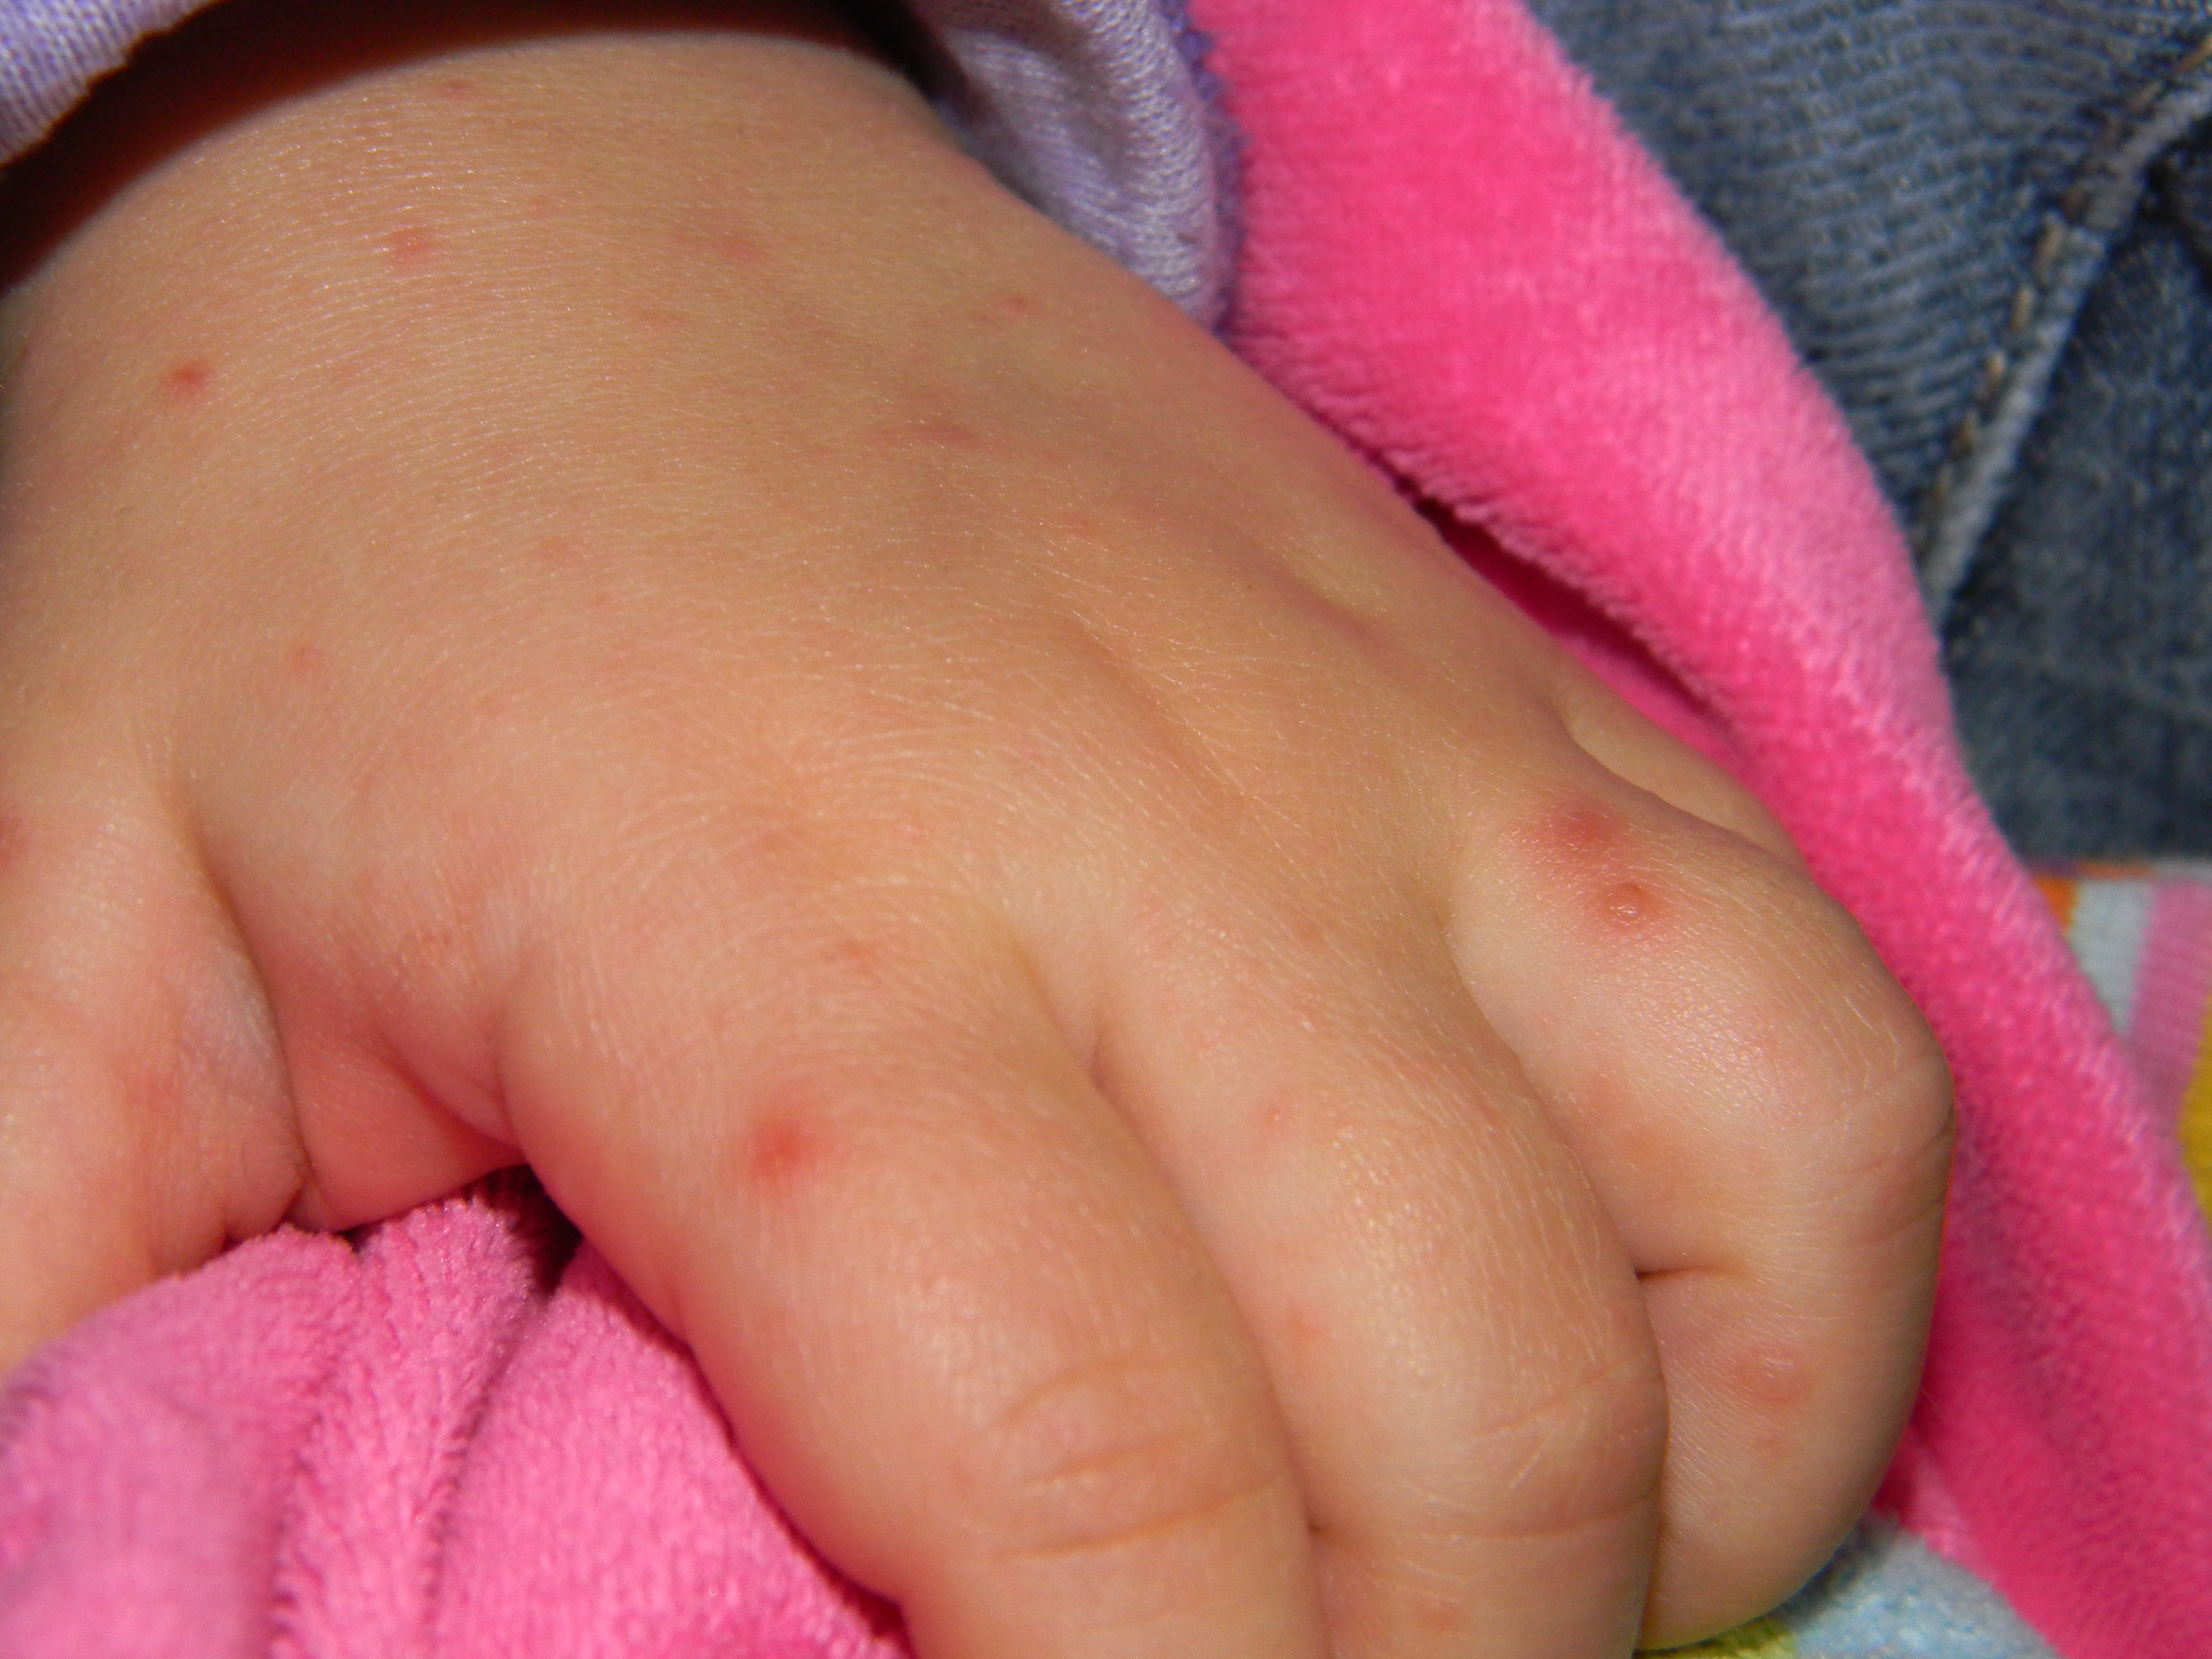 pied main bouche bebe 1 mois